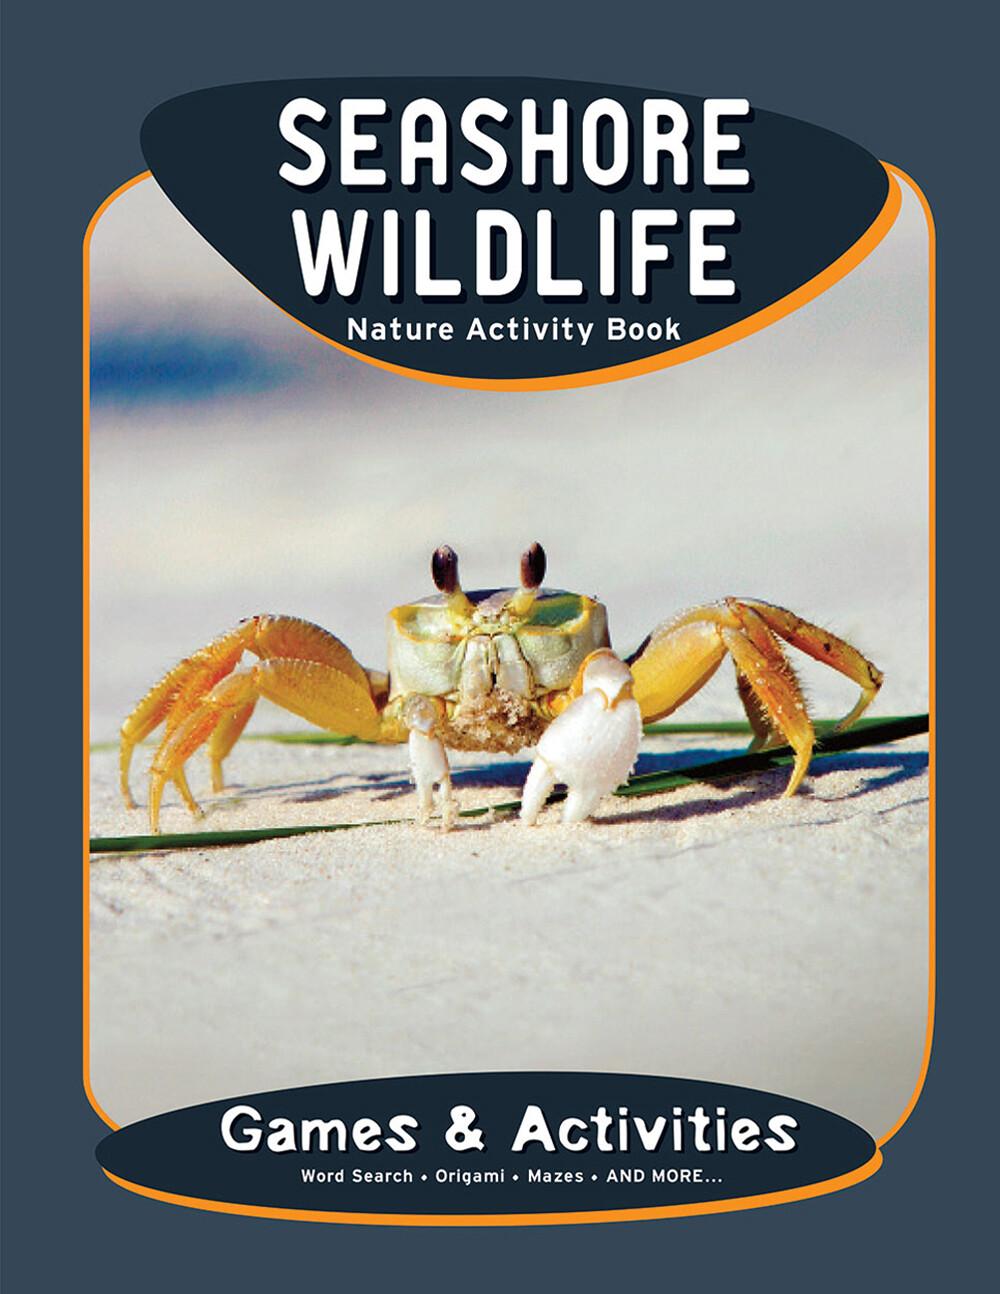 Nature Activity Book: Seashore Wildlife